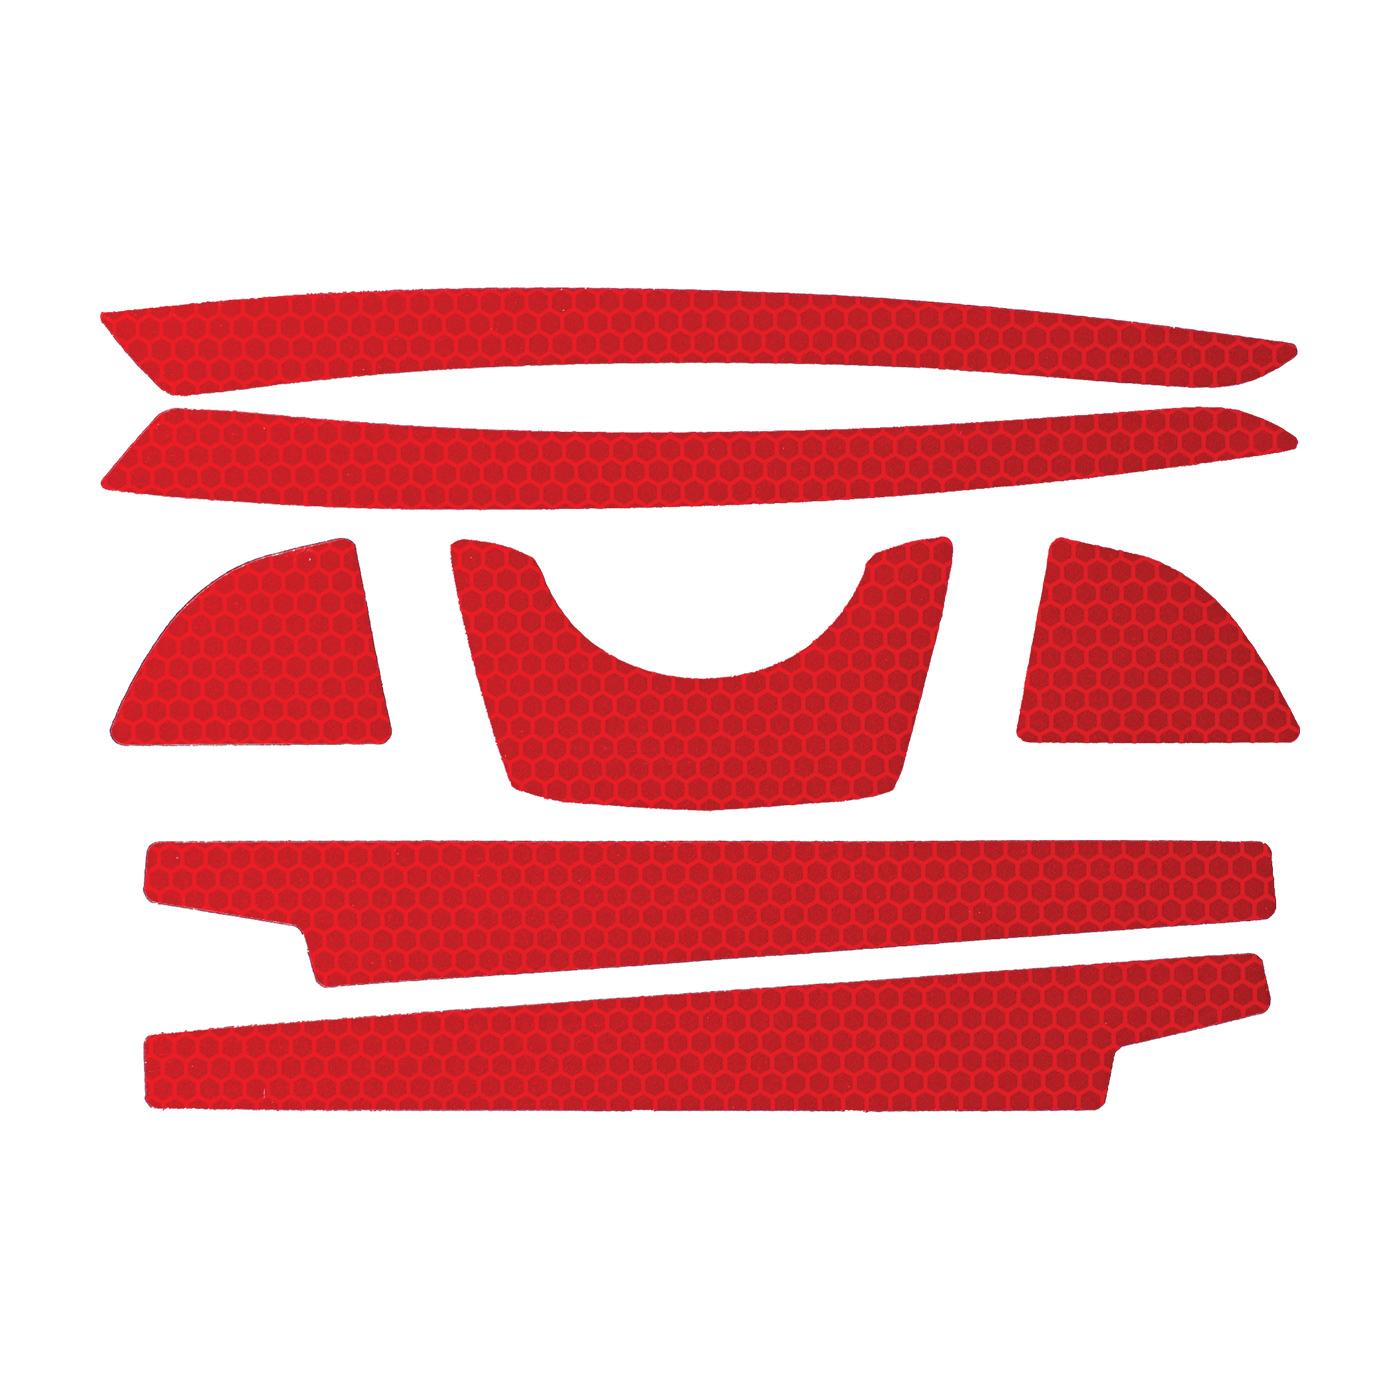 JSP® 281-CR2FB-10-RE Reflective Kit, Red